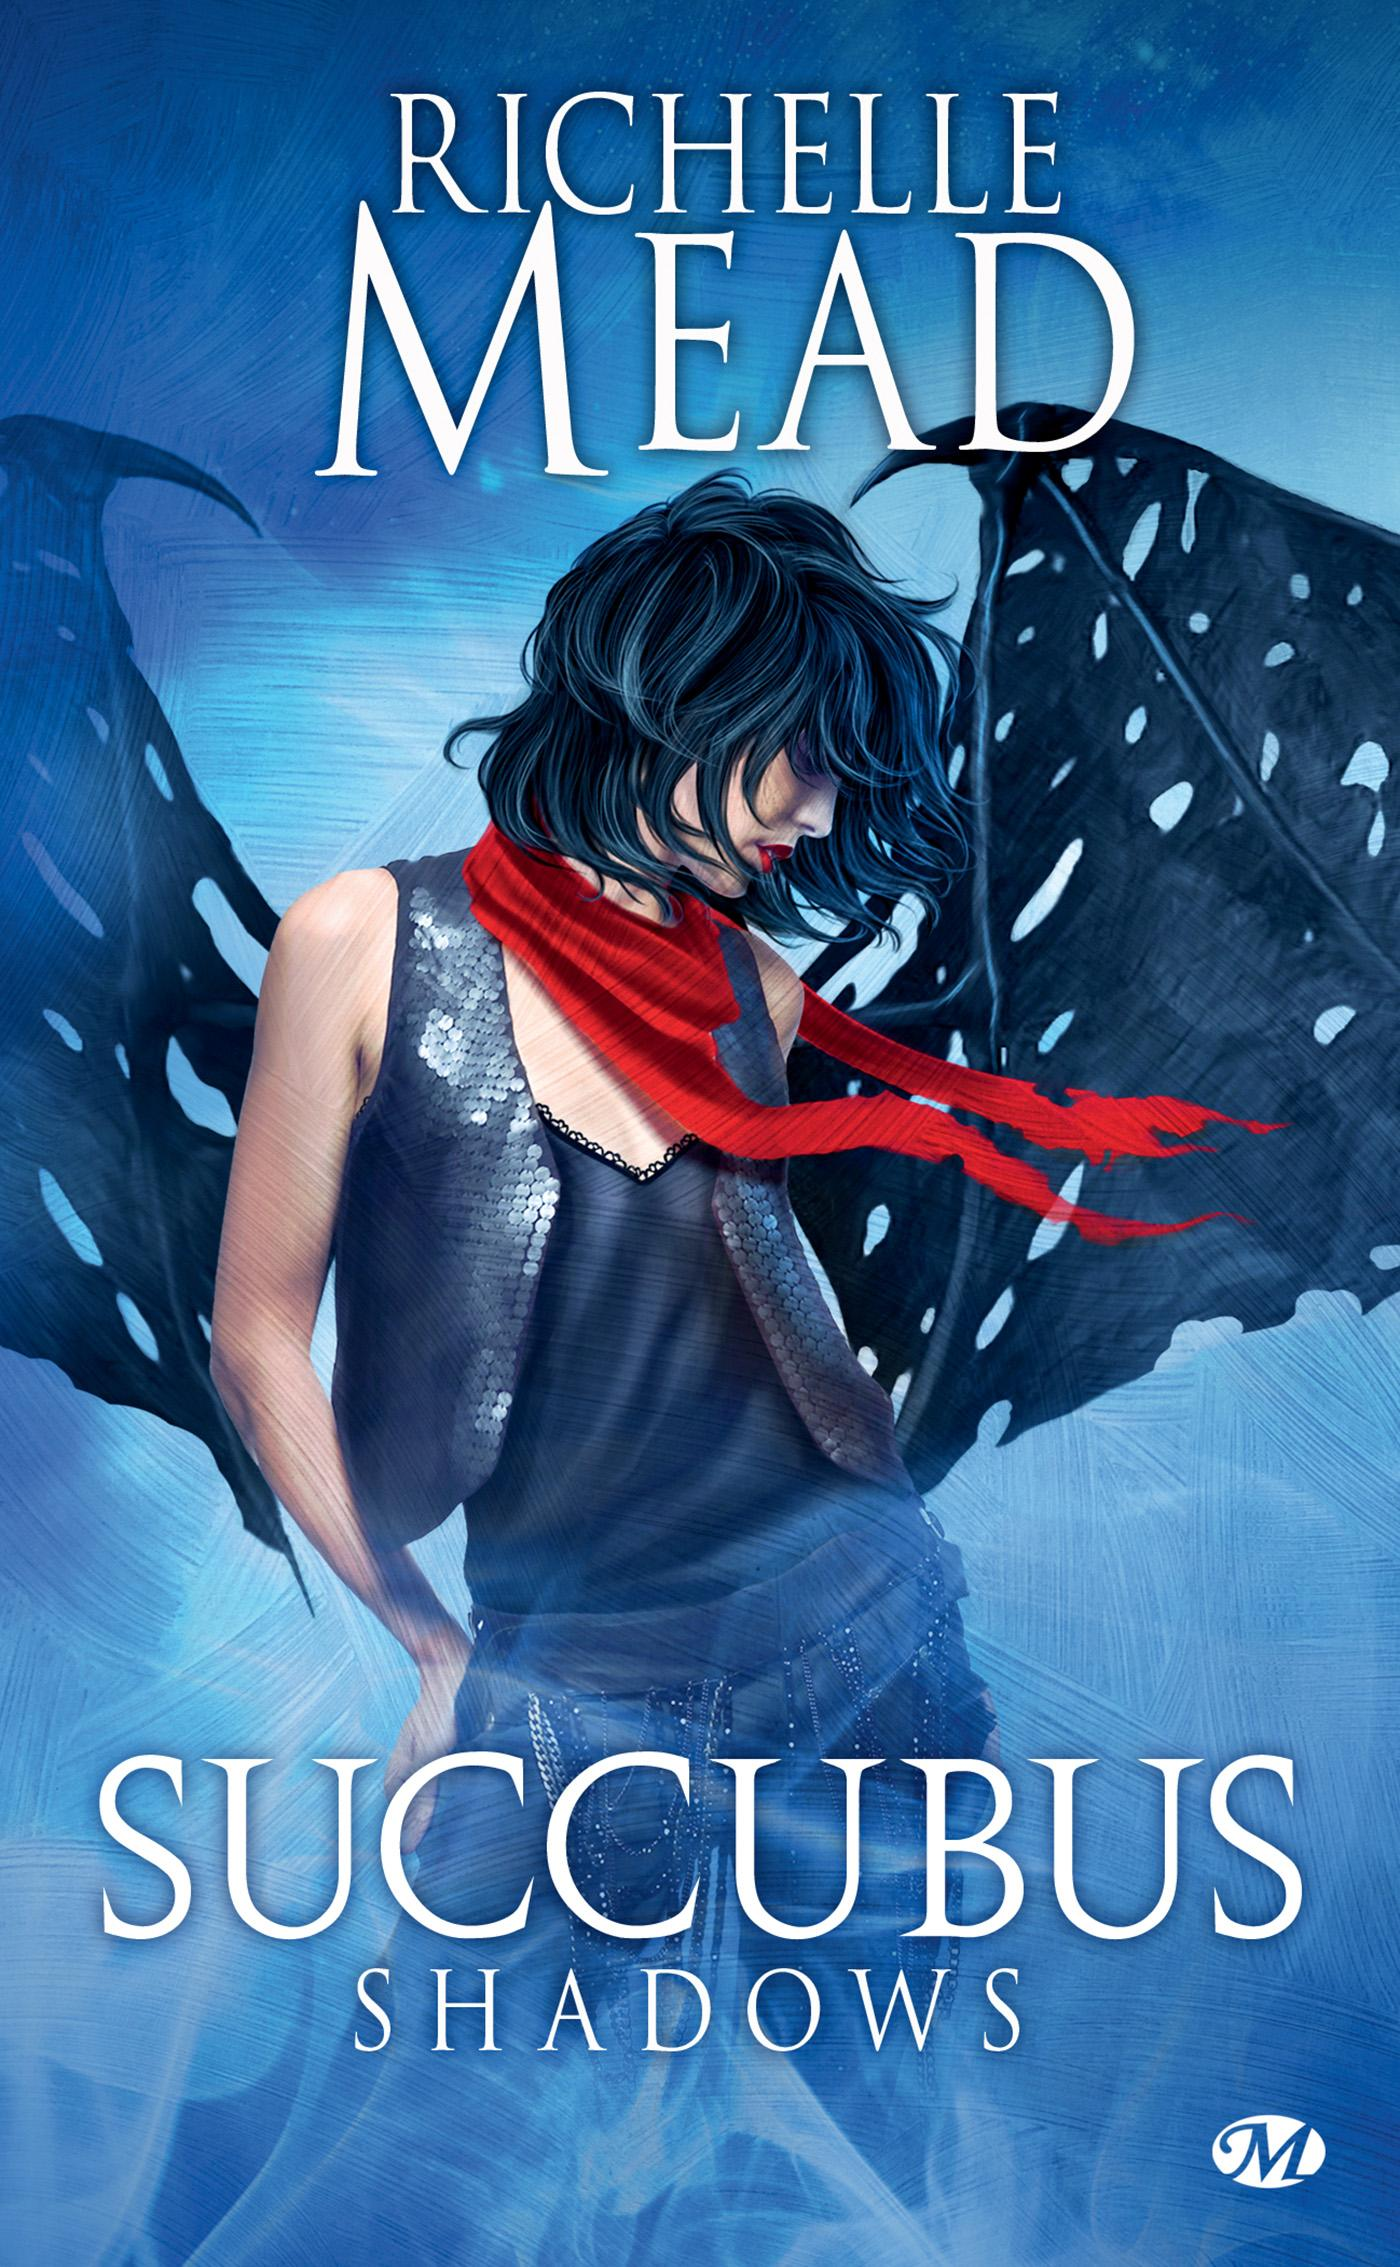 Succubus Shadows, SUCCUBUS, T5